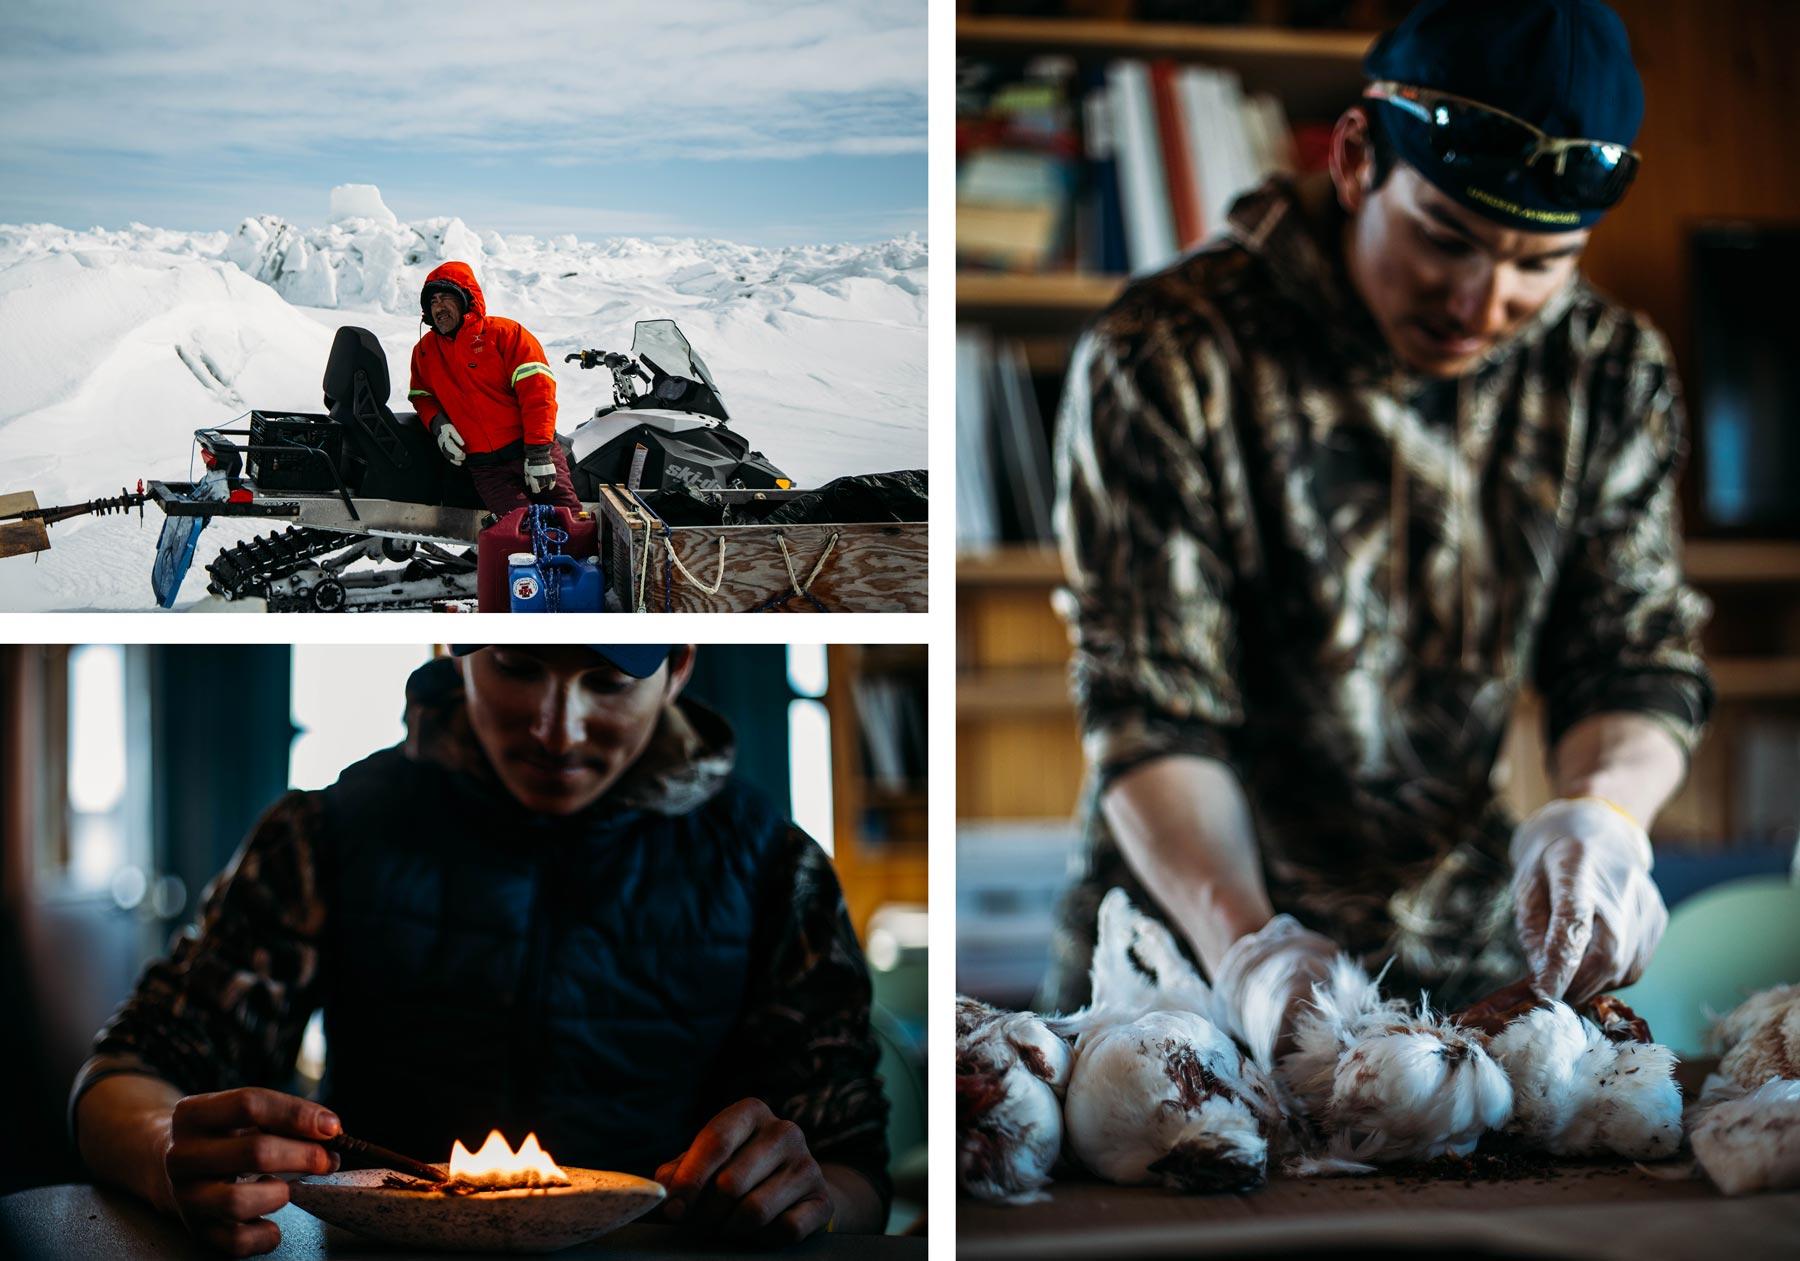 histoire et culture Inuite du Nunavik